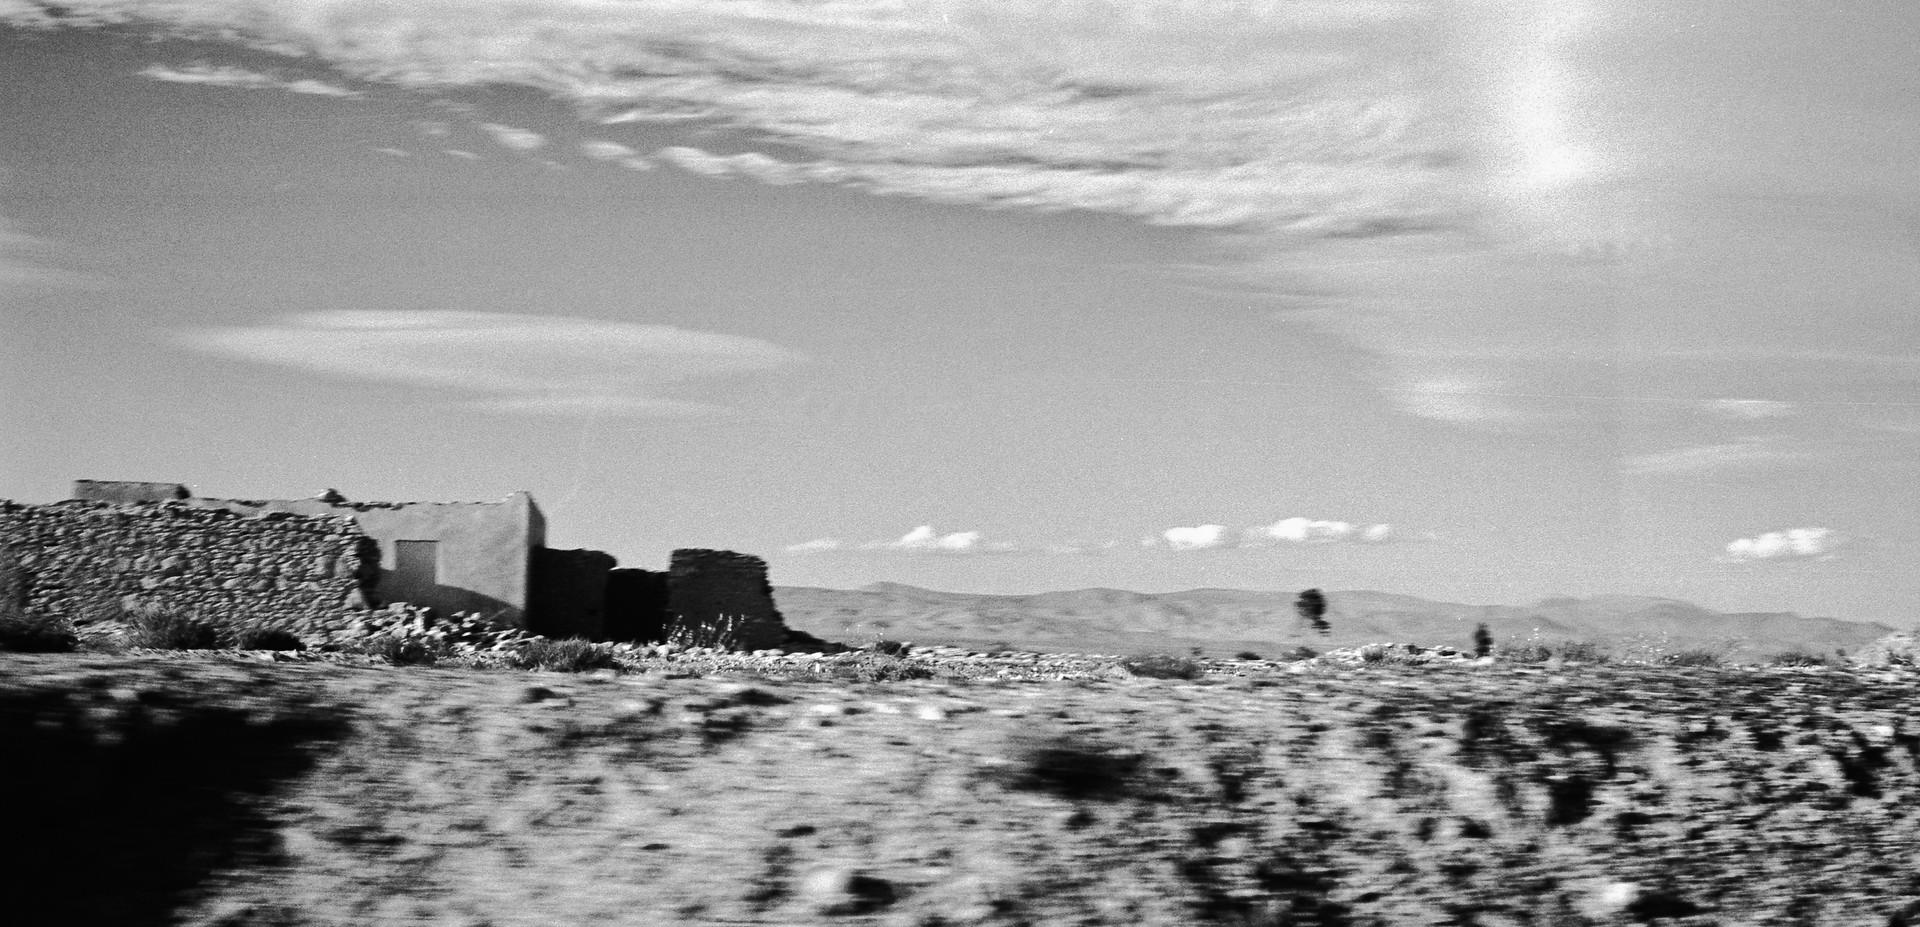 Near Tangier, Morocco 1984